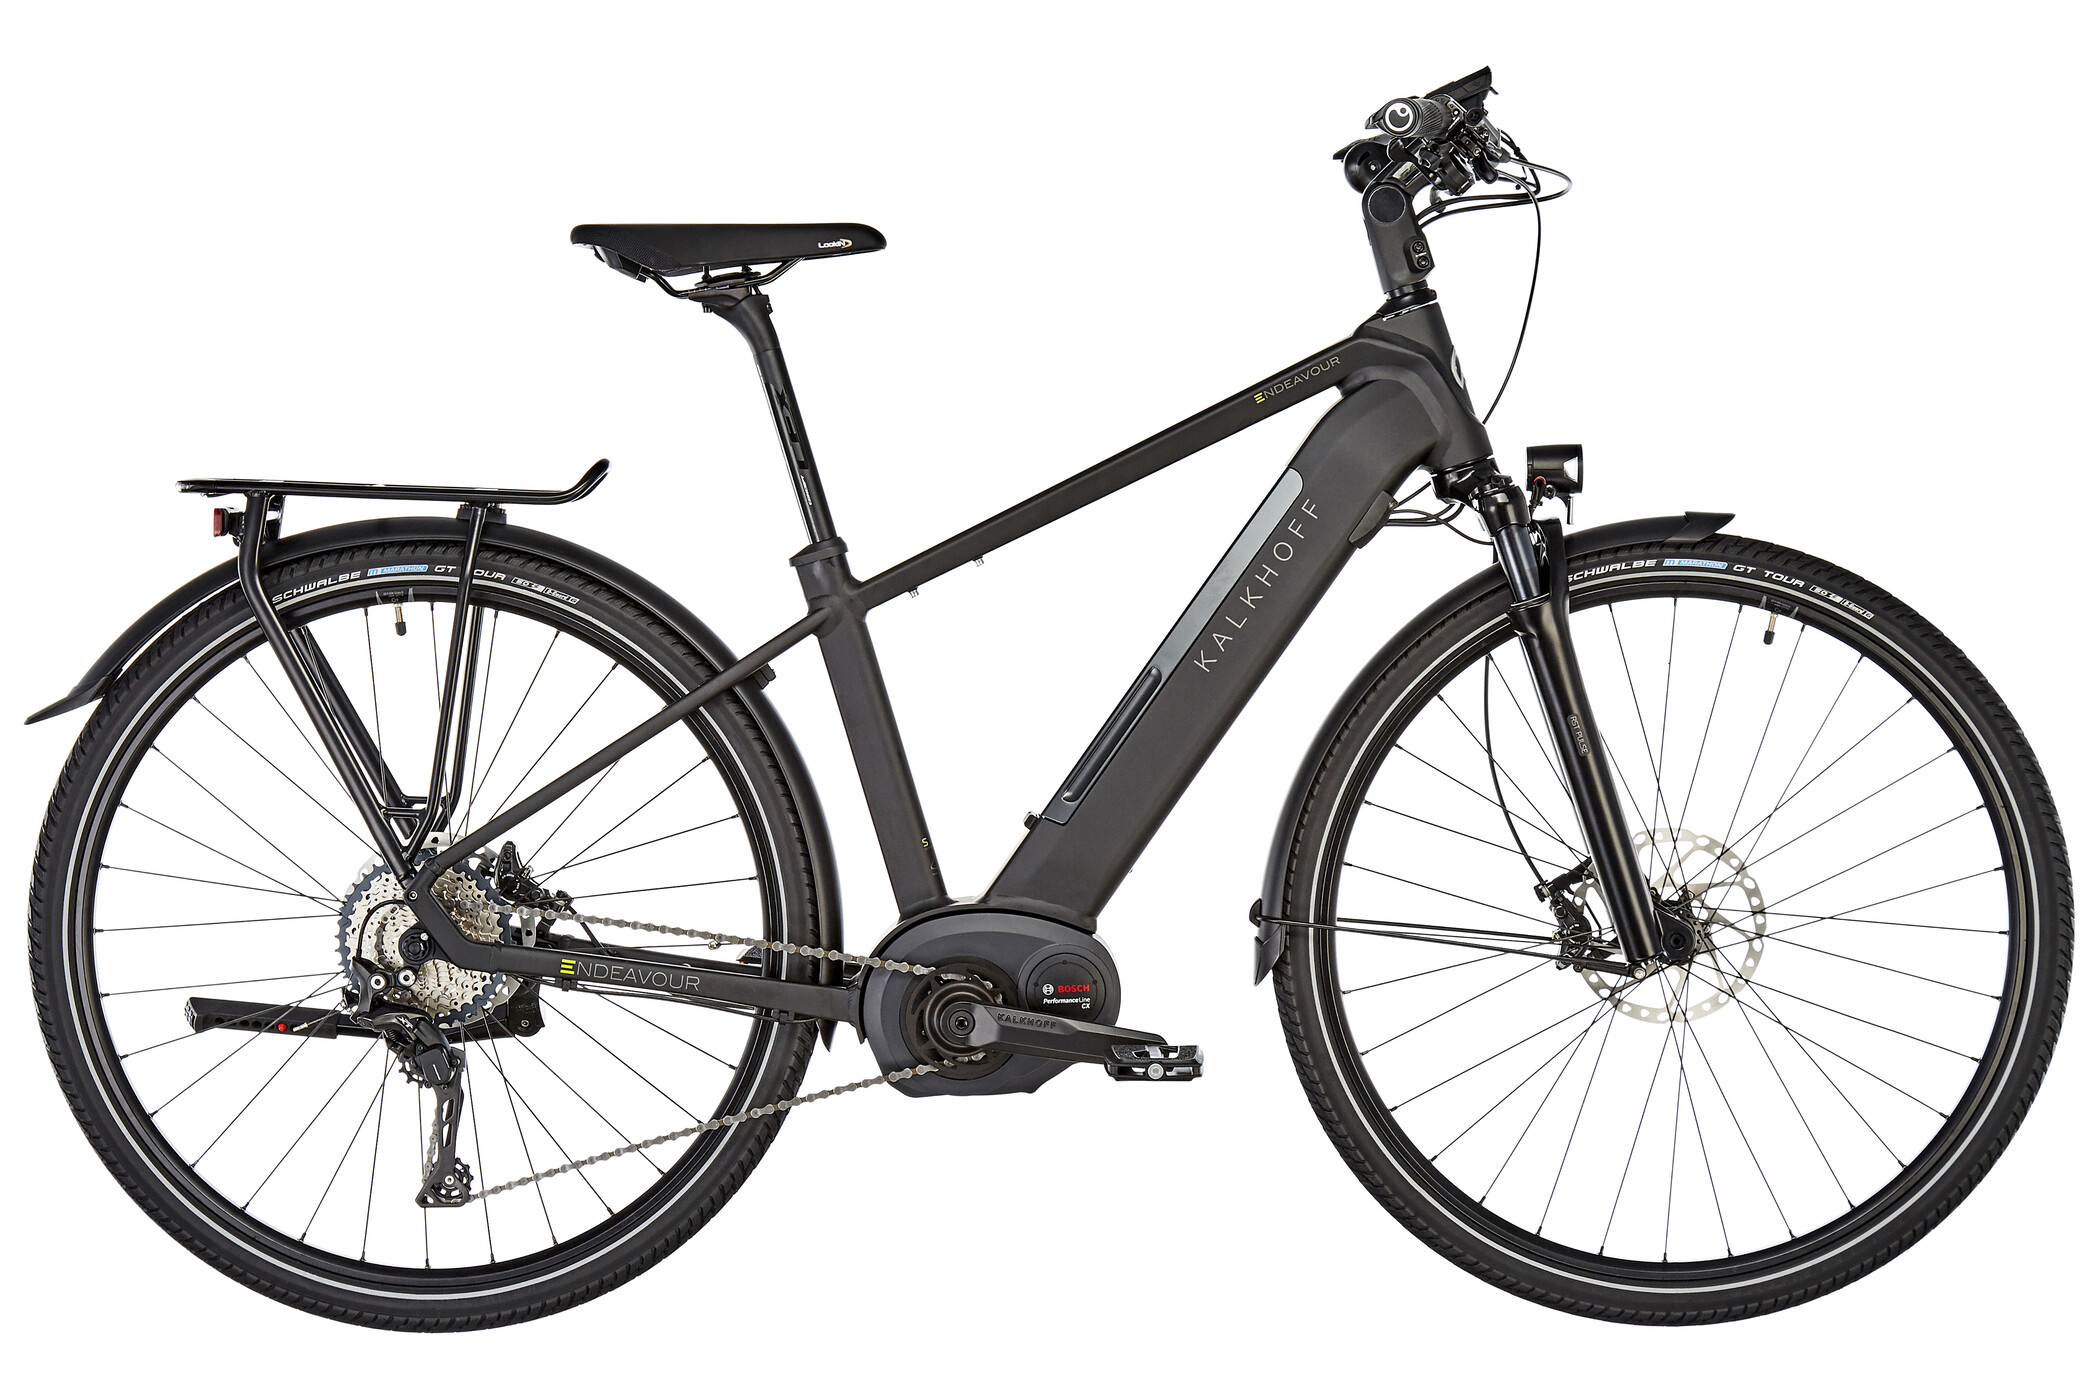 "Kalkhoff Endeavour Excite B11 E-trekkingcykel 28"" 500Wh sort (2019) | City-cykler"